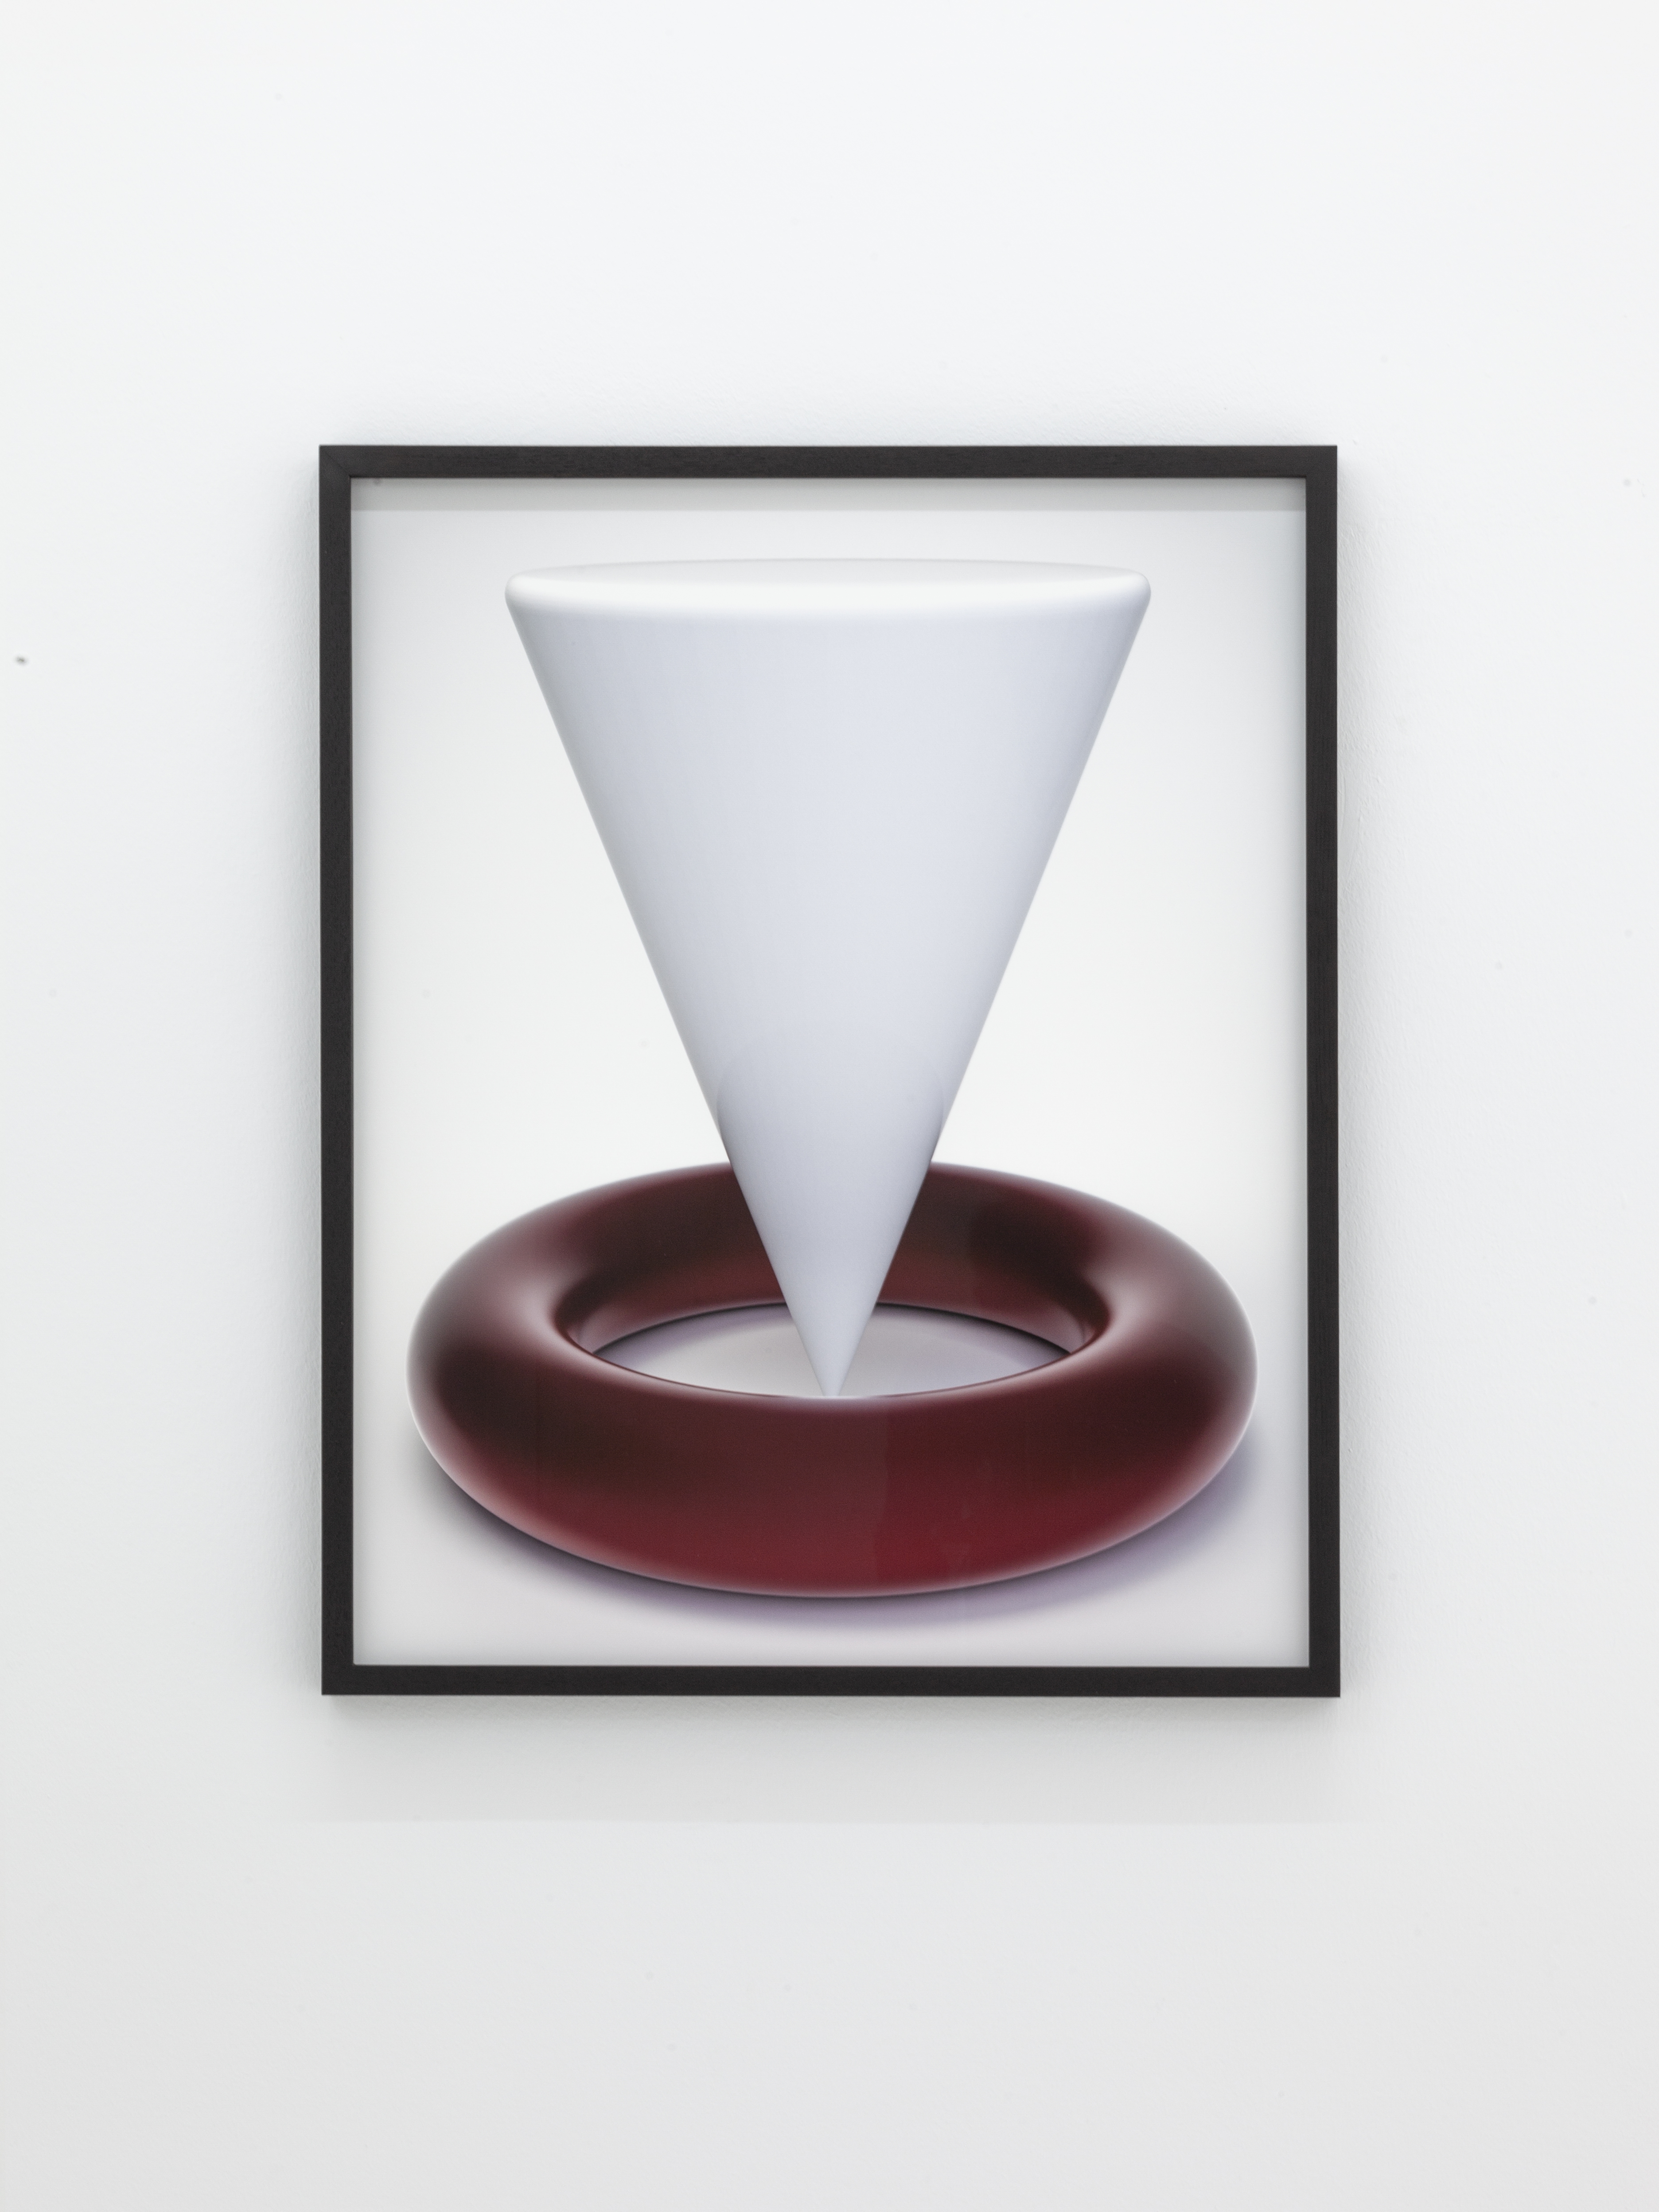 Banz & Bowinkel, Primitive I 09, CGI, 64 cm x 80 cm, 2018